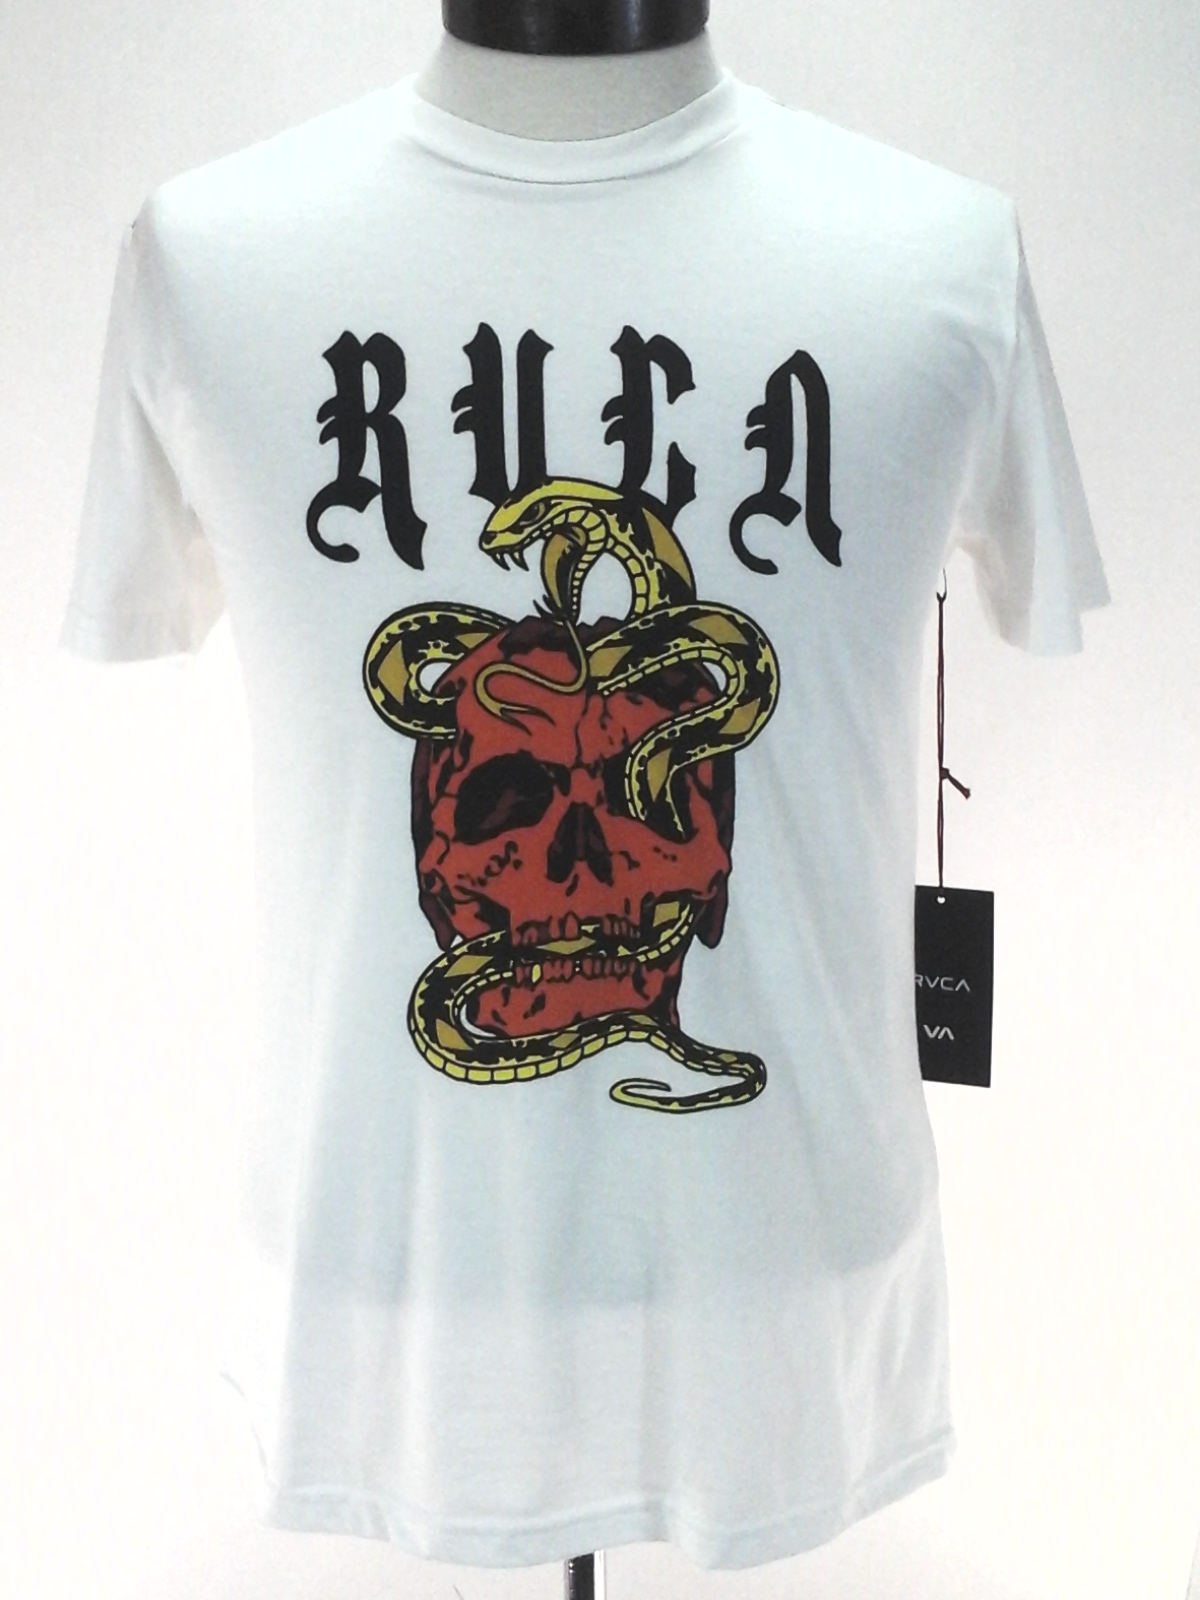 RVCA Men/'s Serpent Type Crewneck Logo Graphic Tee T-Shirt Black